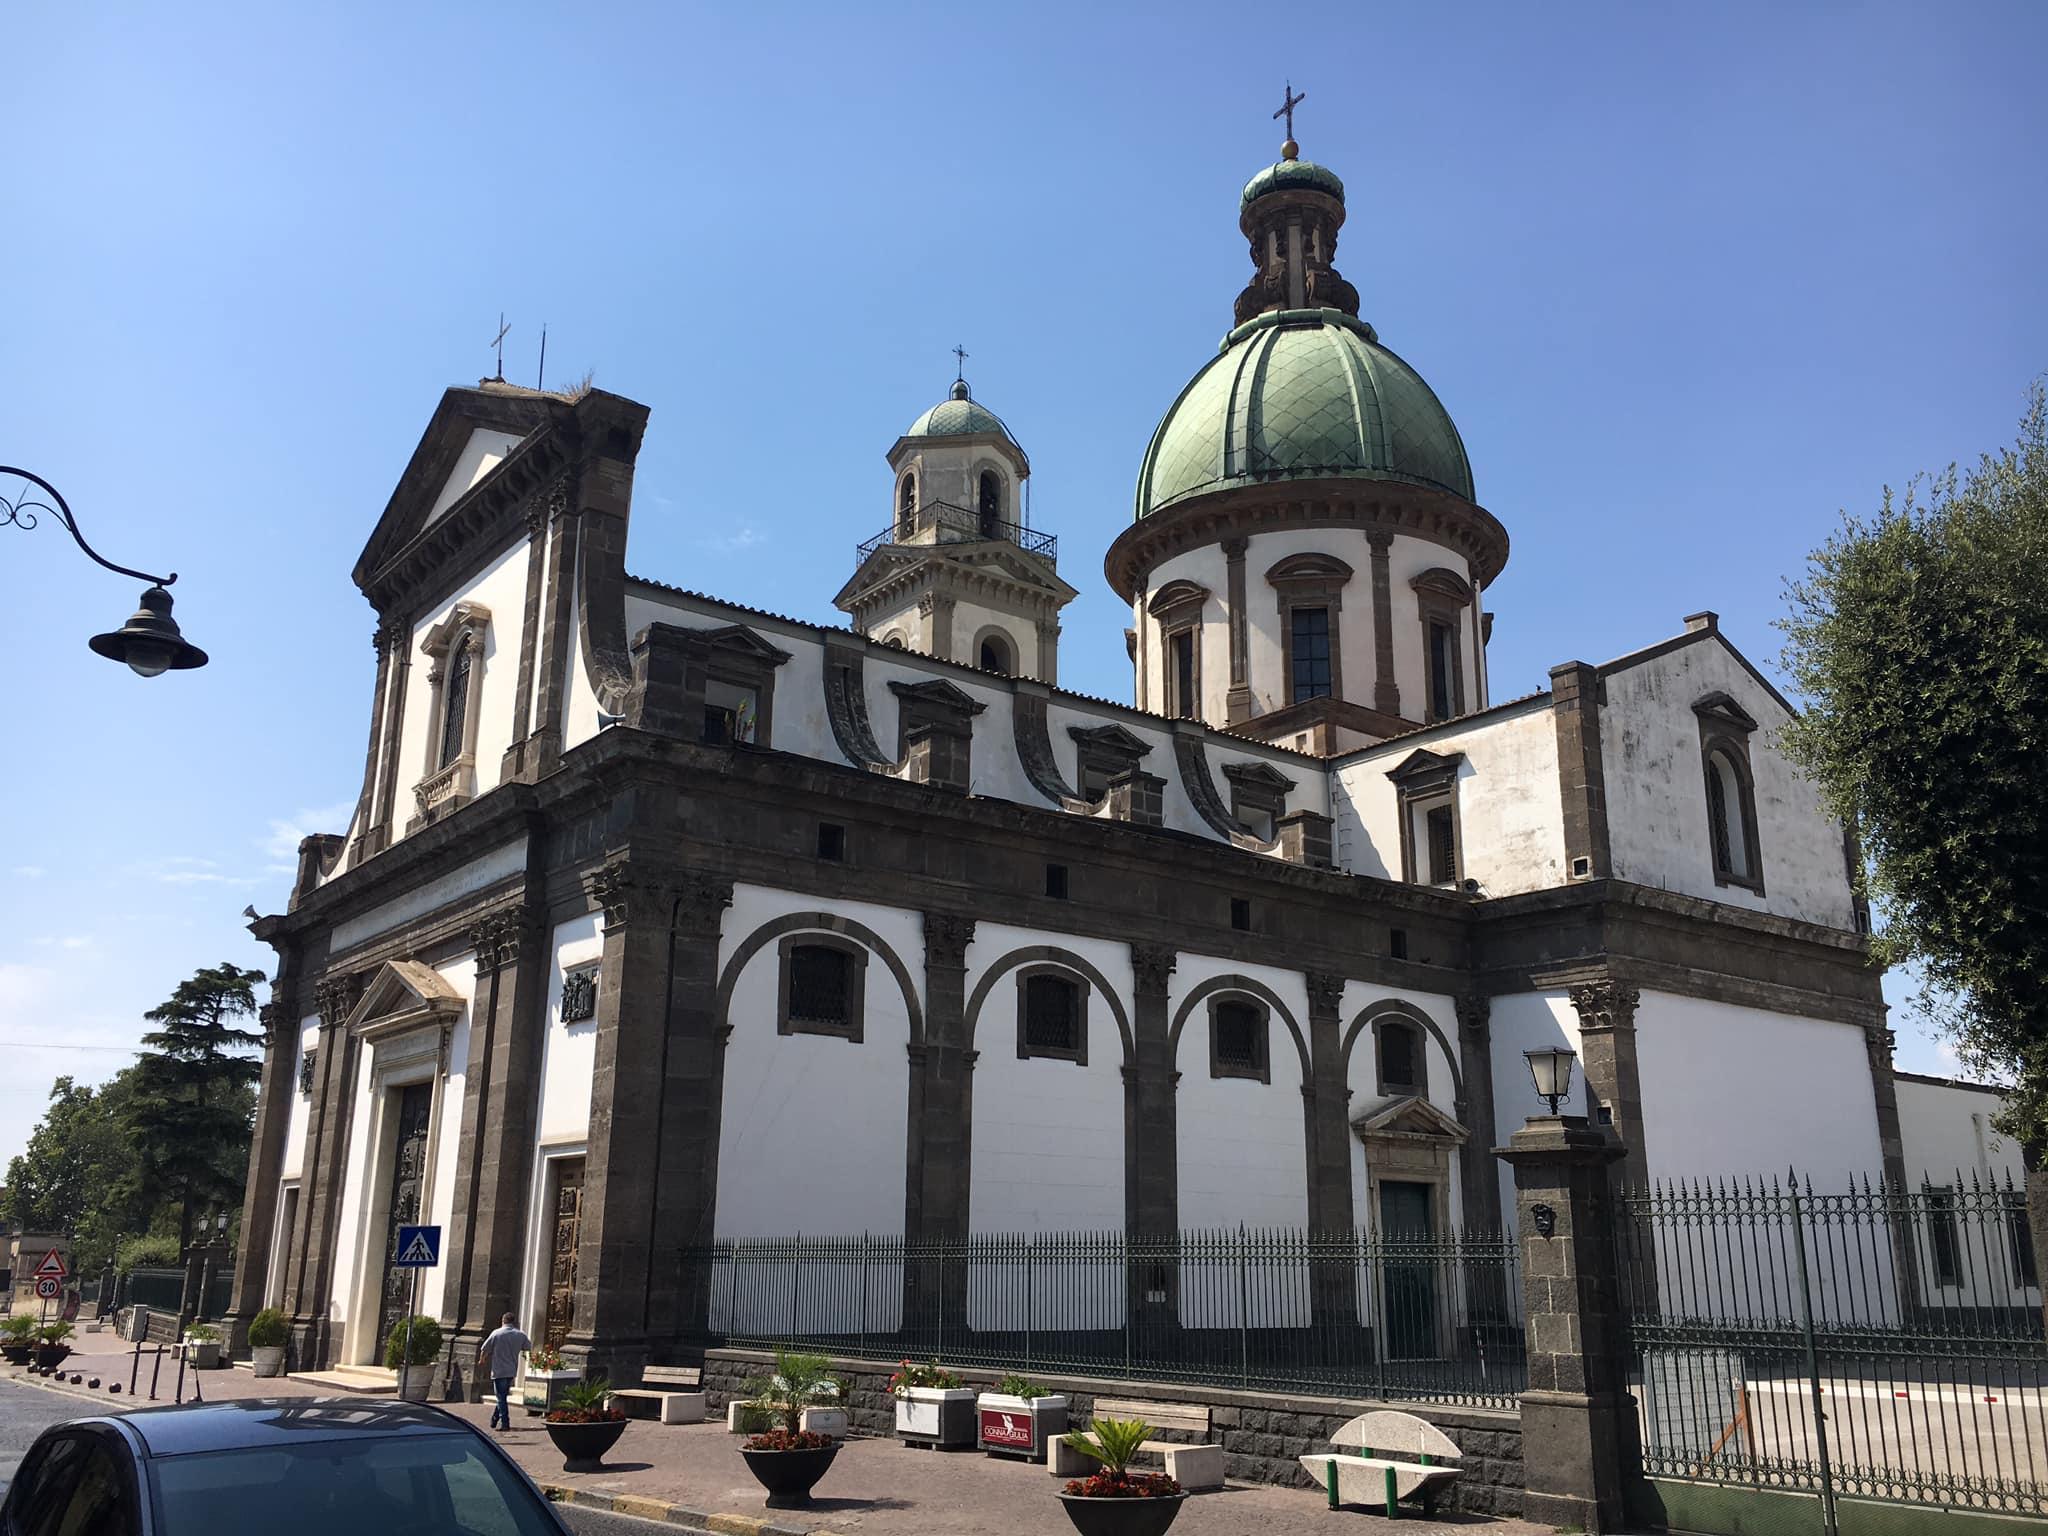 Santuario Madonna dell'Arco